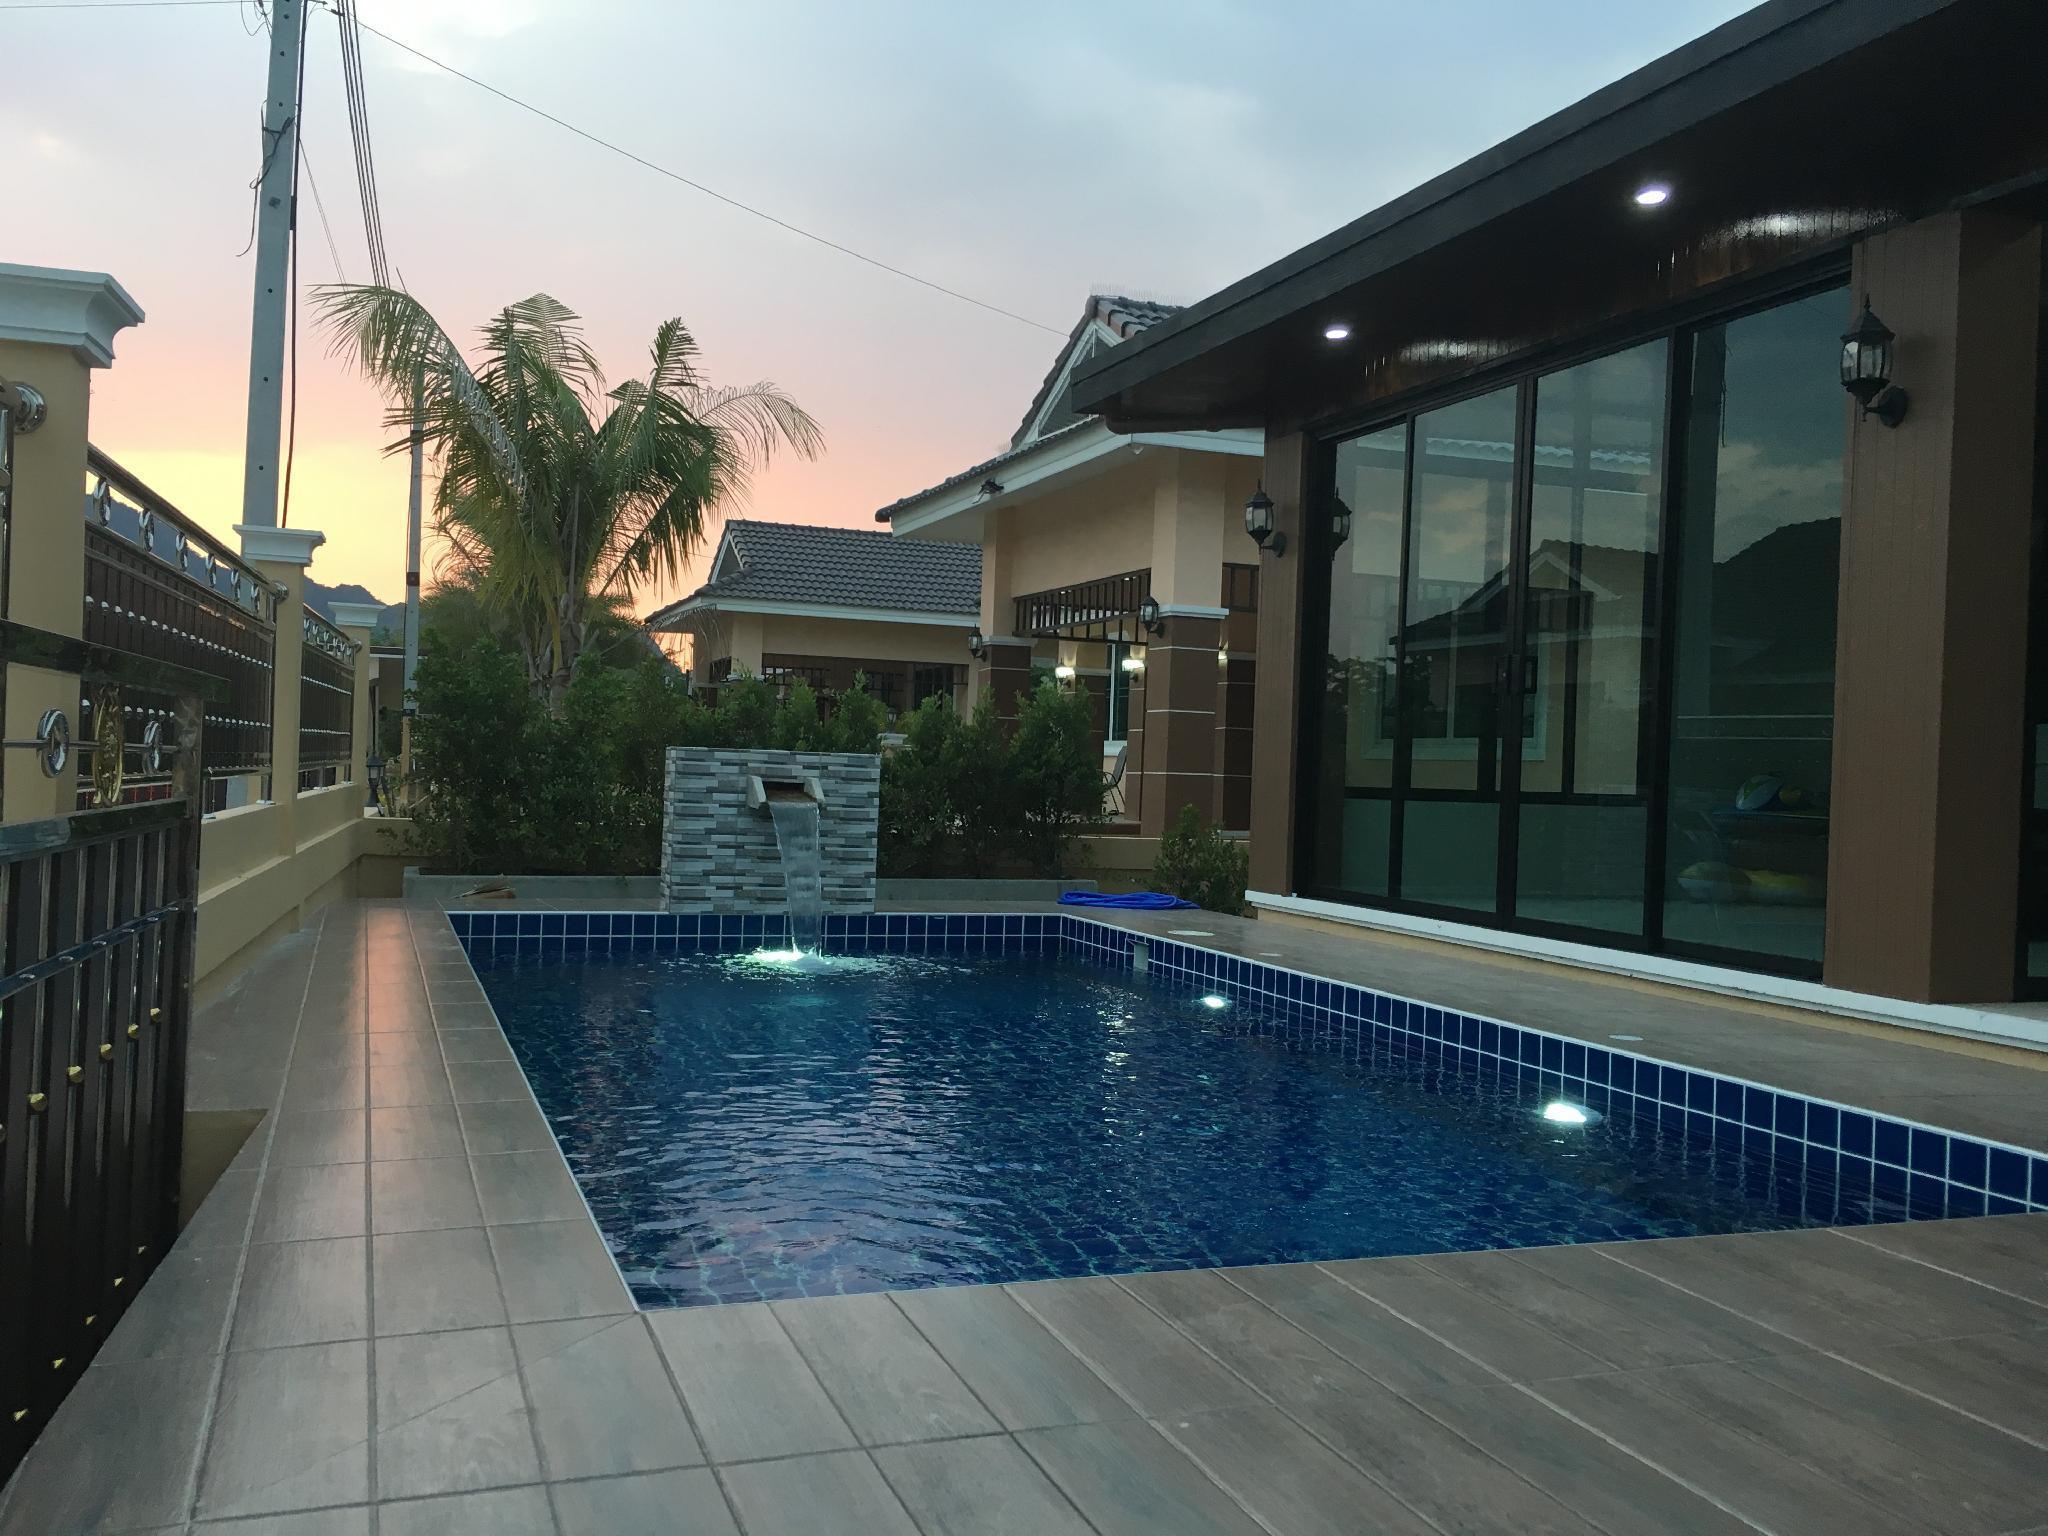 Fuji House Cha-Am Pool villa near the beach บ้านเดี่ยว 3 ห้องนอน 2 ห้องน้ำส่วนตัว ขนาด 120 ตร.ม. – ชายหาดชะอำ